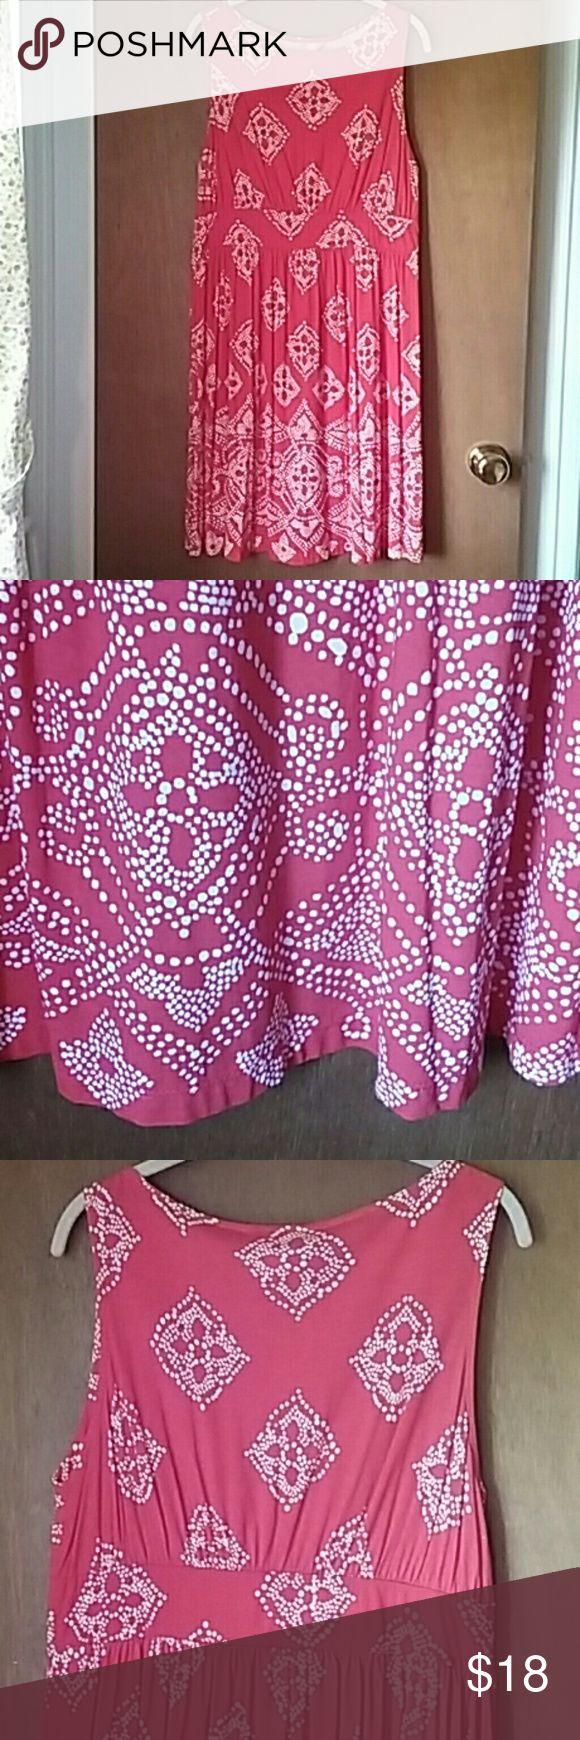 "Joe Fresh sleeveless dress NWOT Bright and pretty reddish orange and white sleeveless dress in almost a bandana pattern.  Joe Fresh for J C Penney 38"" long New, no tags. Never worn. Joe Fresh Dresses"